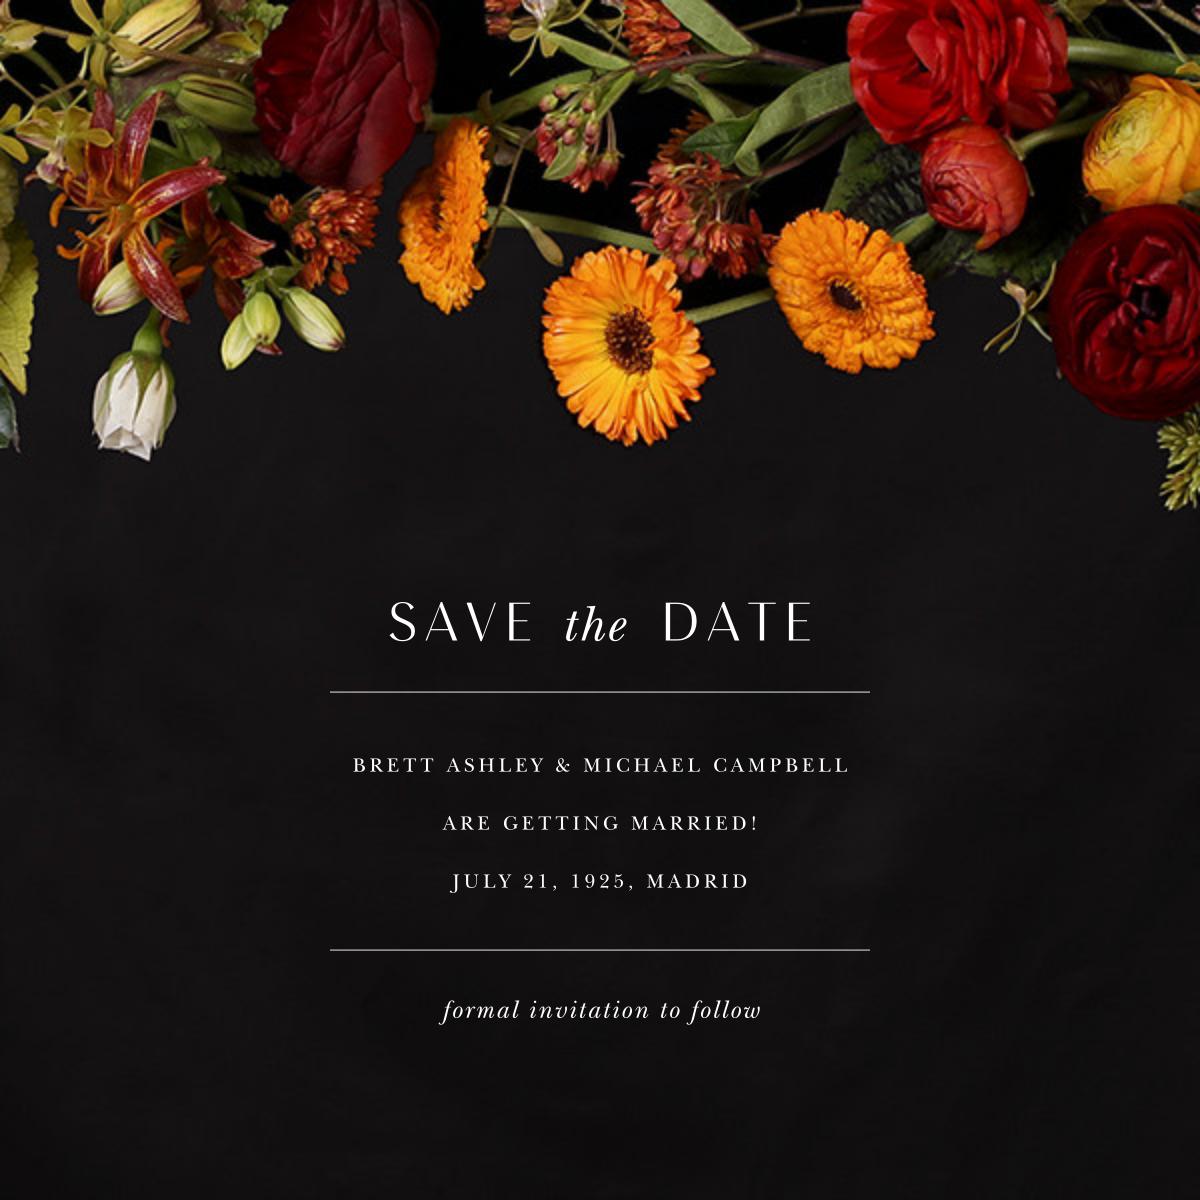 Vendémiaire (Save the Date) - Putnam & Putnam - Save the date